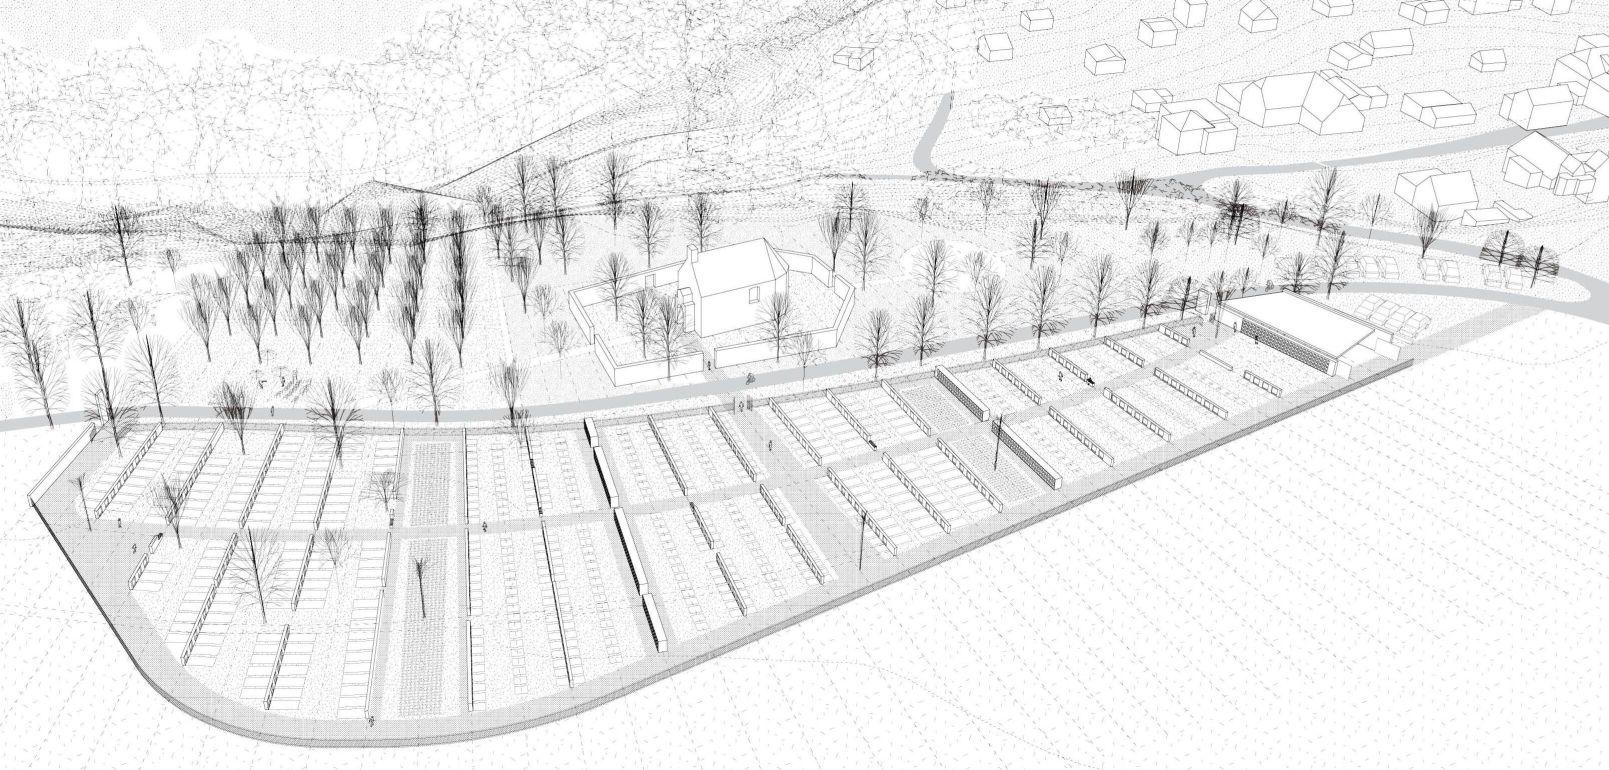 hřbitov-návrh 7 nadhled